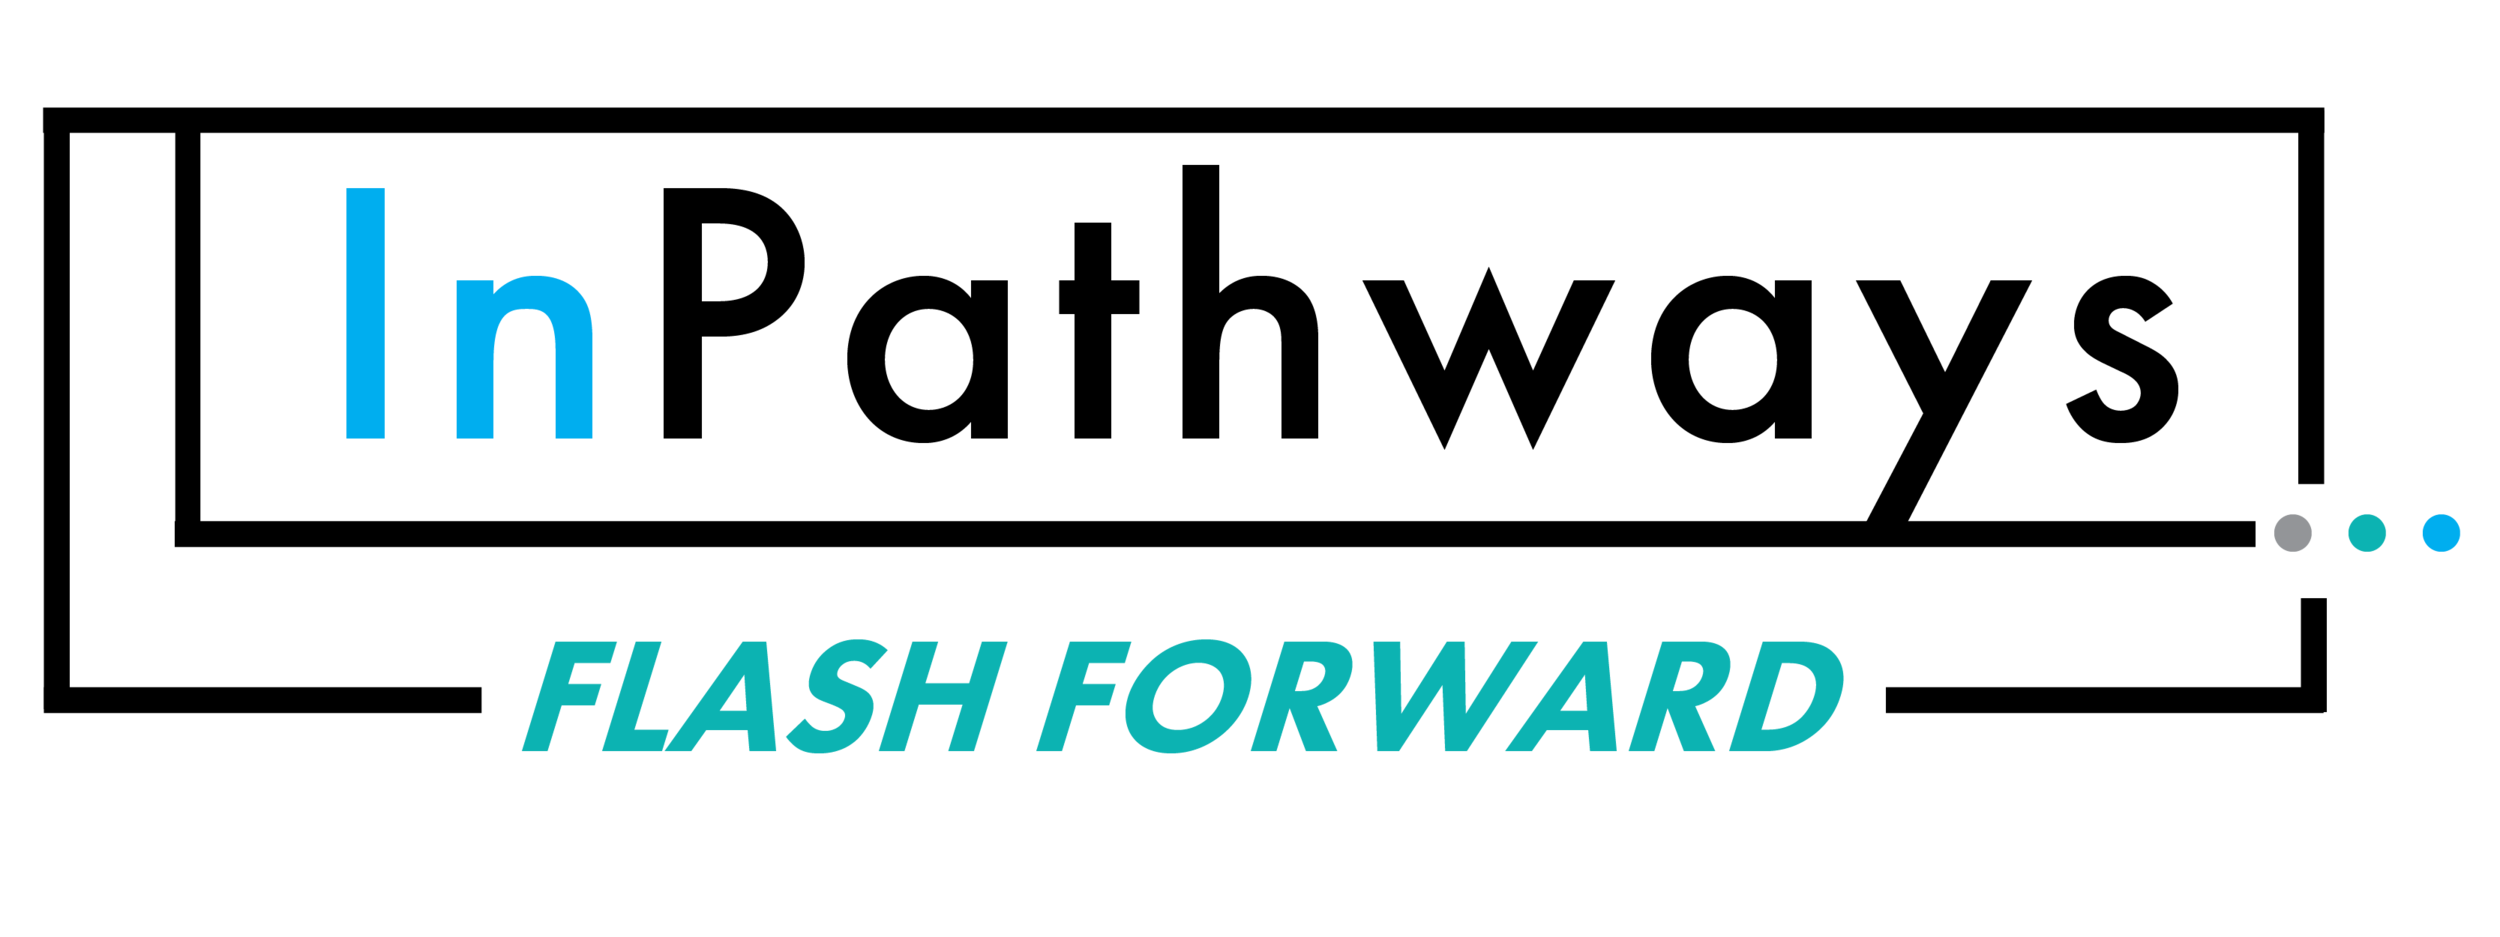 InPathways - Flash Forward - transparent (1).png